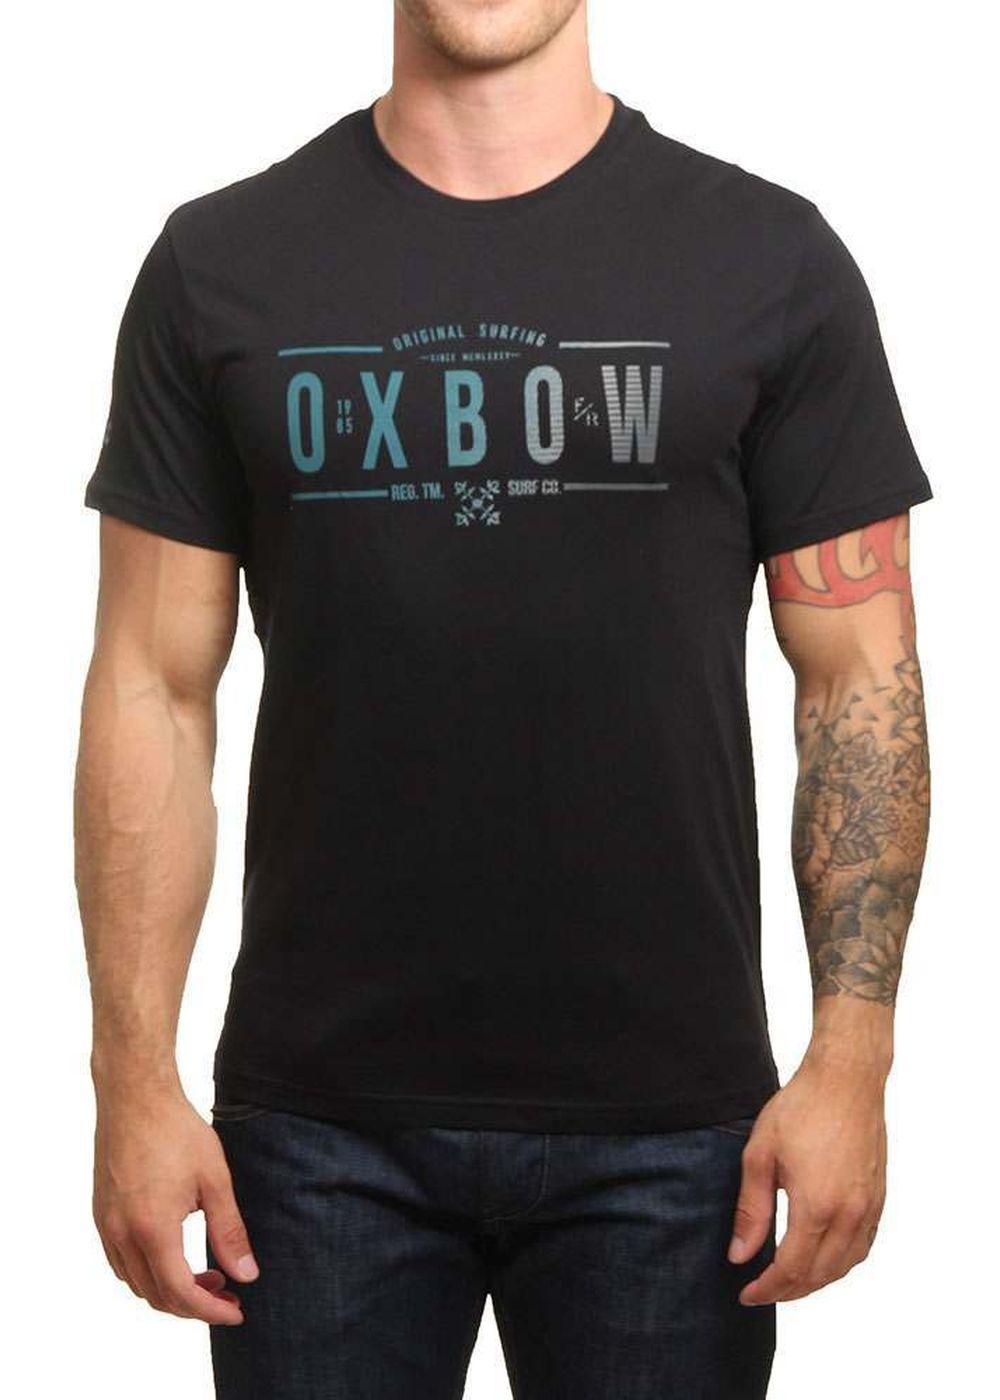 oxbow-totiam-tee-noir